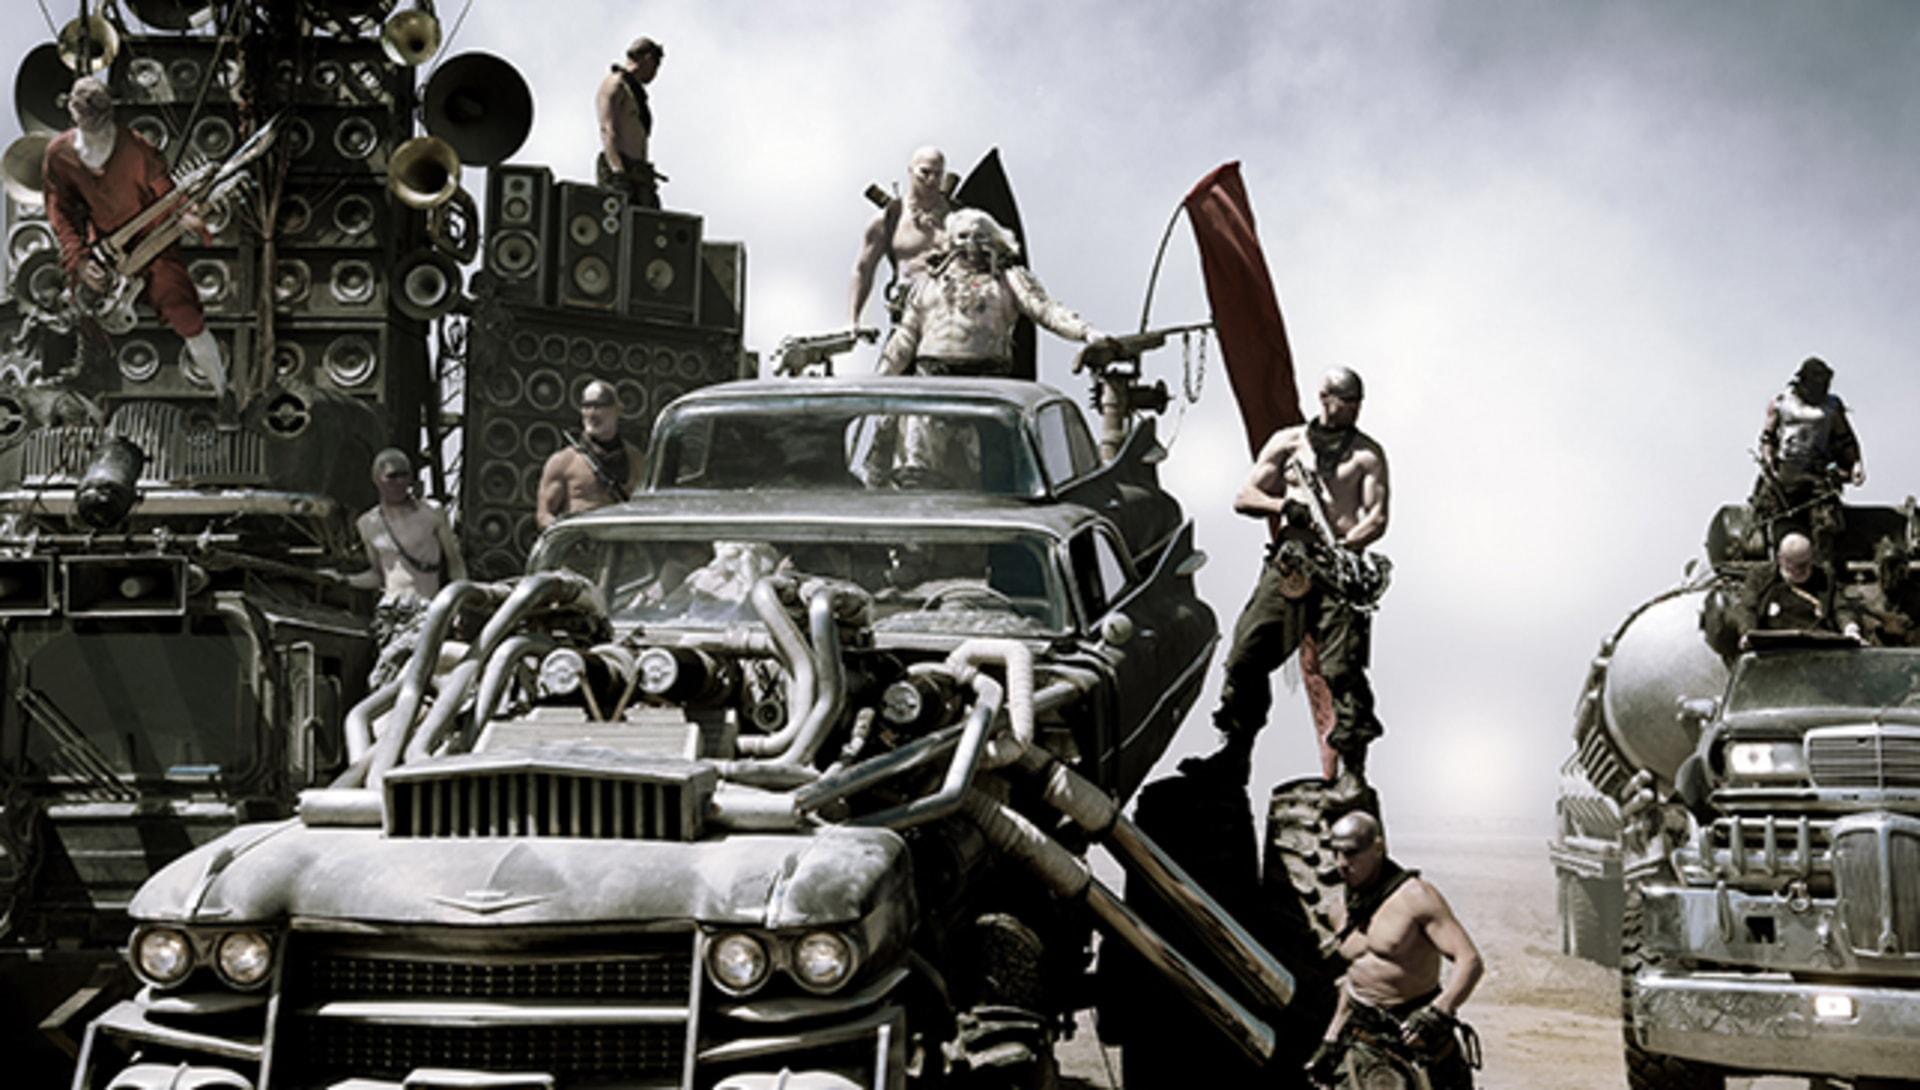 Mad Max: Fury Road - Image 10